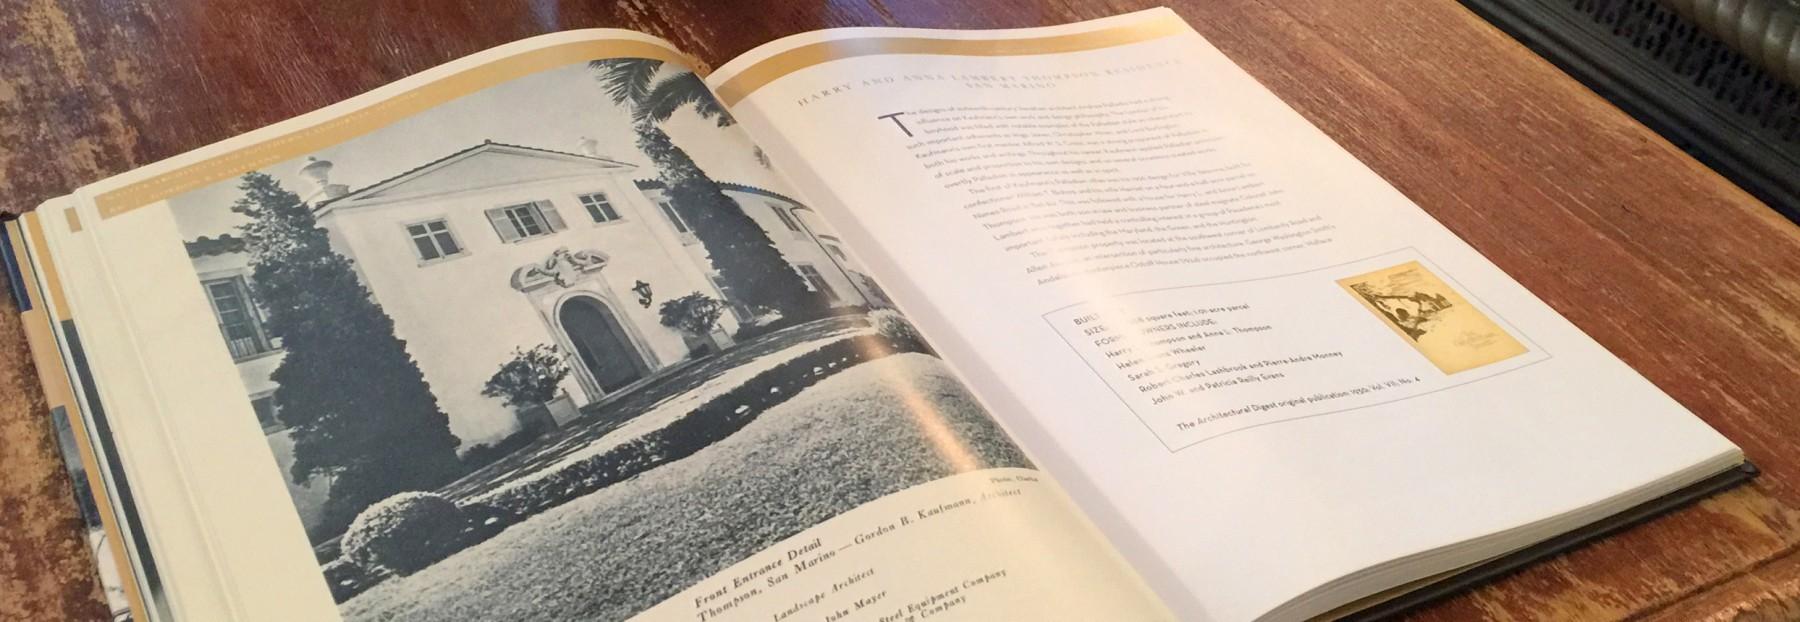 Lentini-Design-Kaufmann-Book